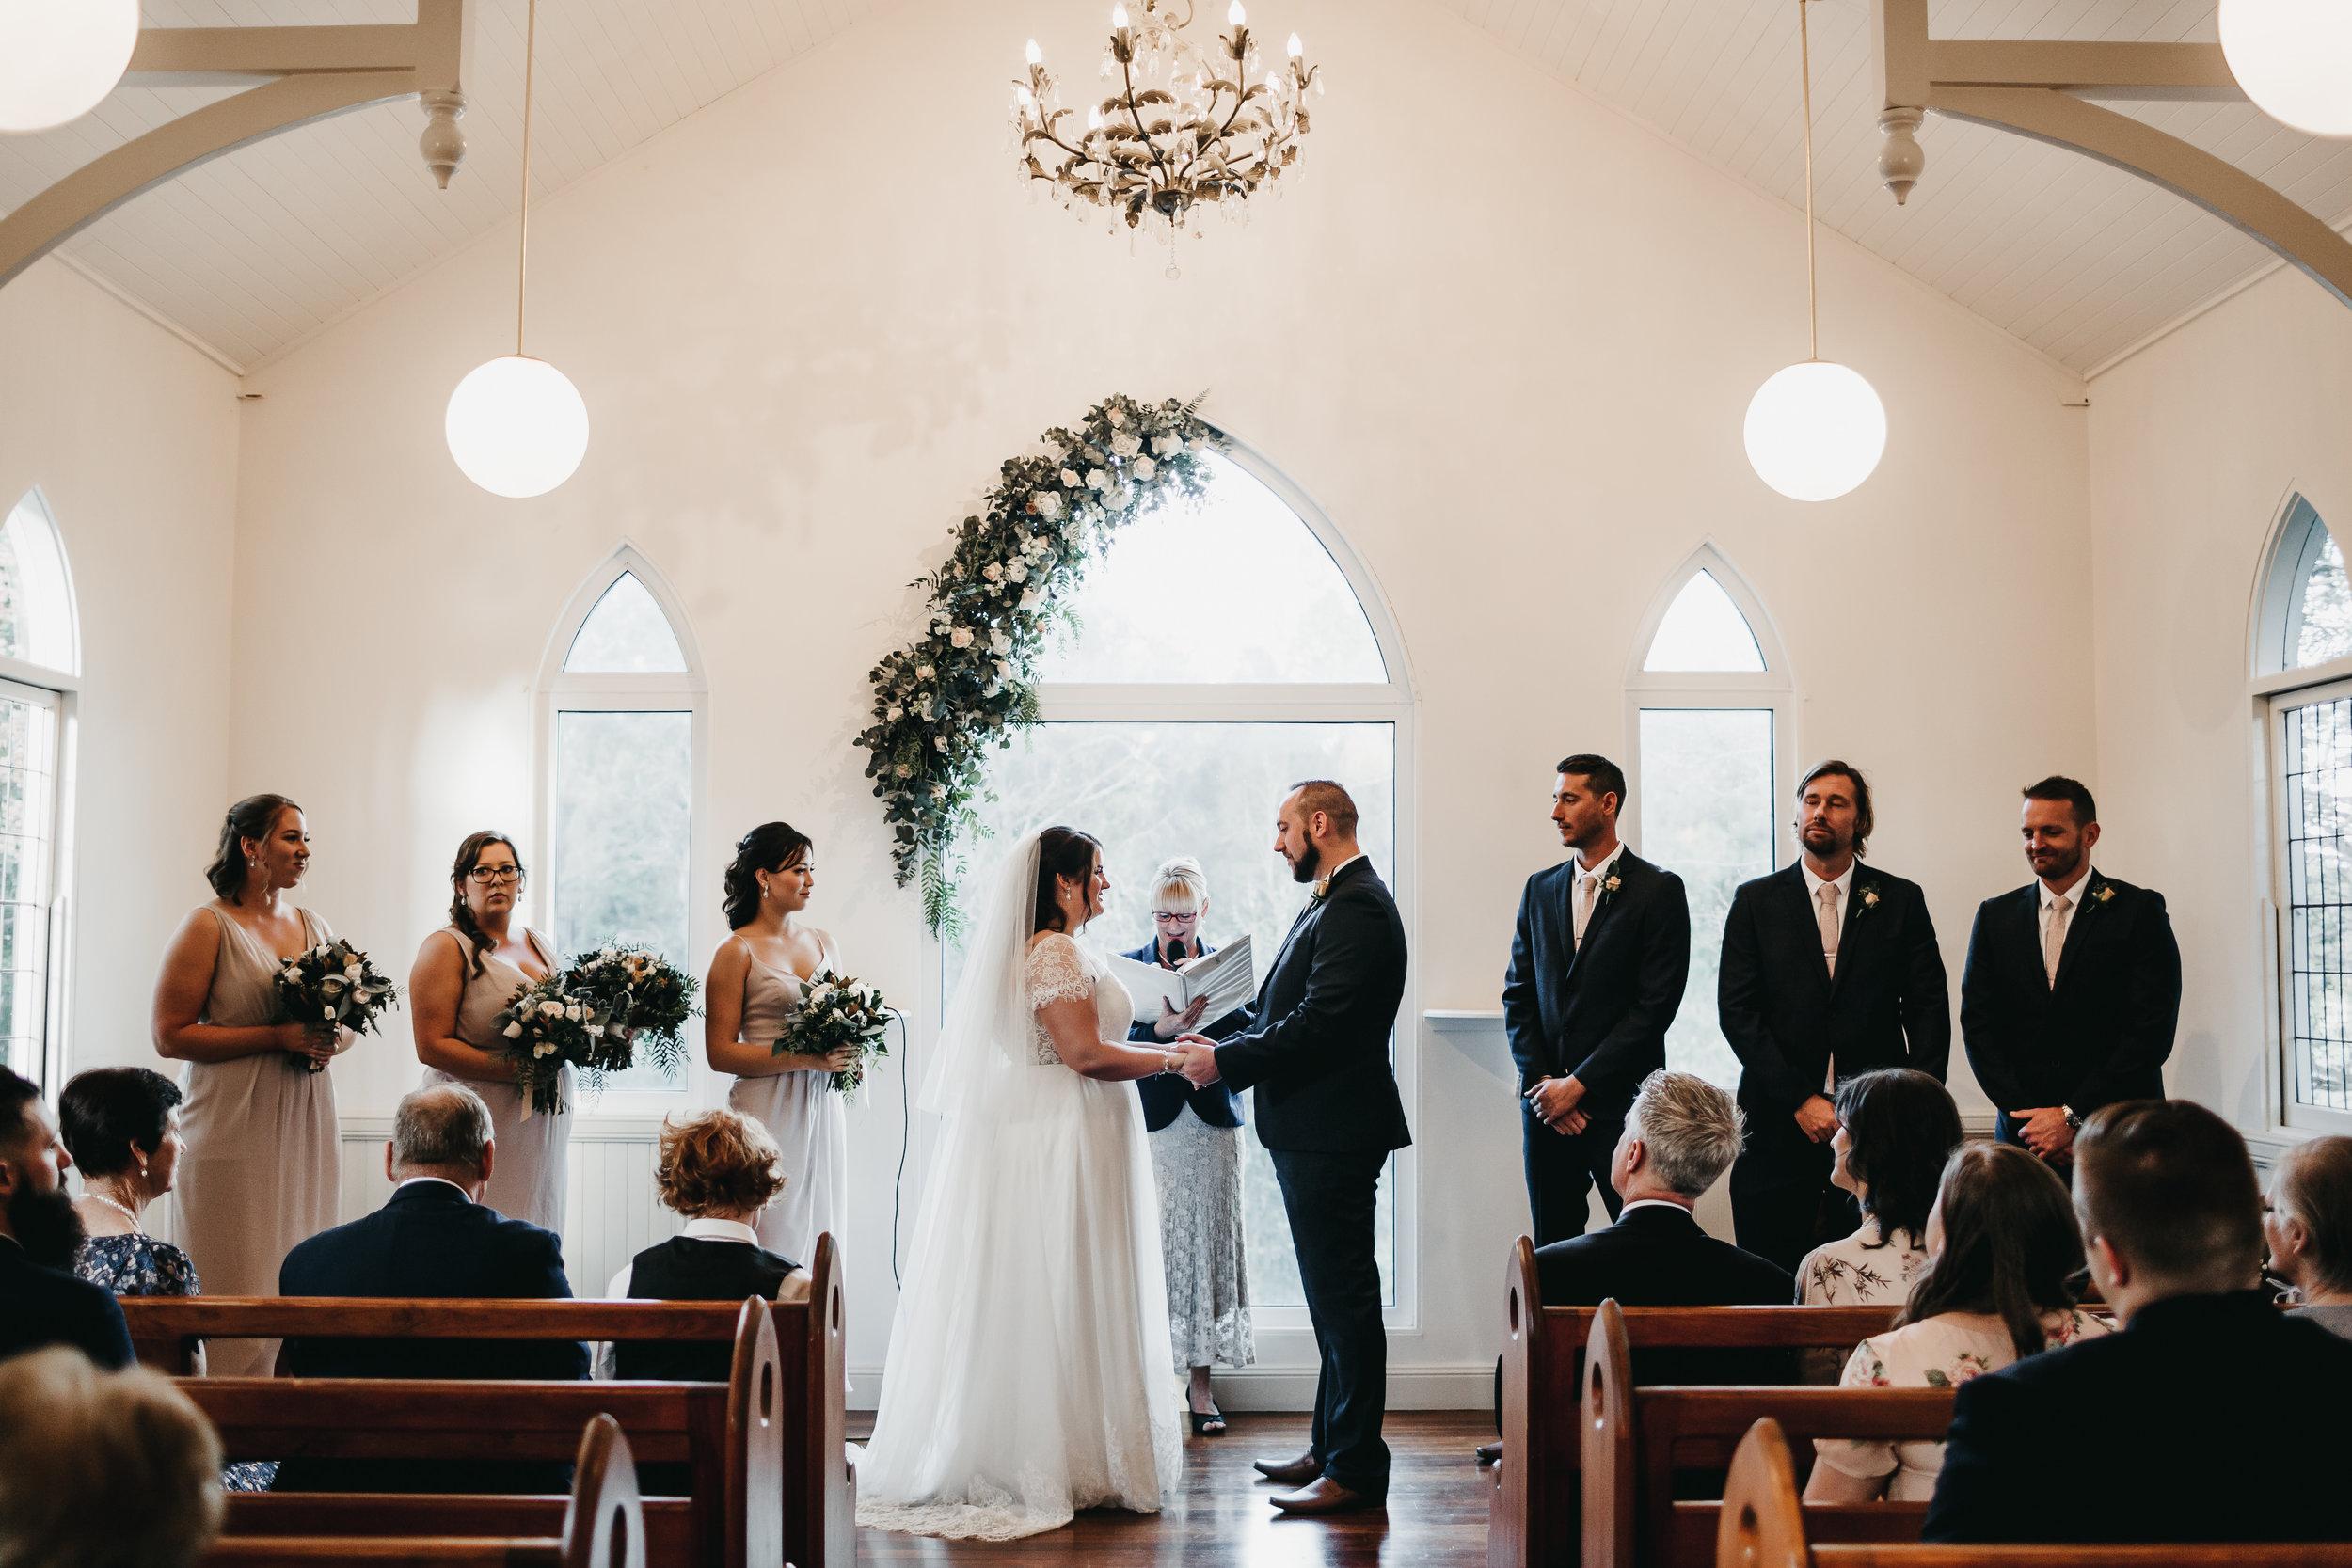 bondwedding-346.jpg